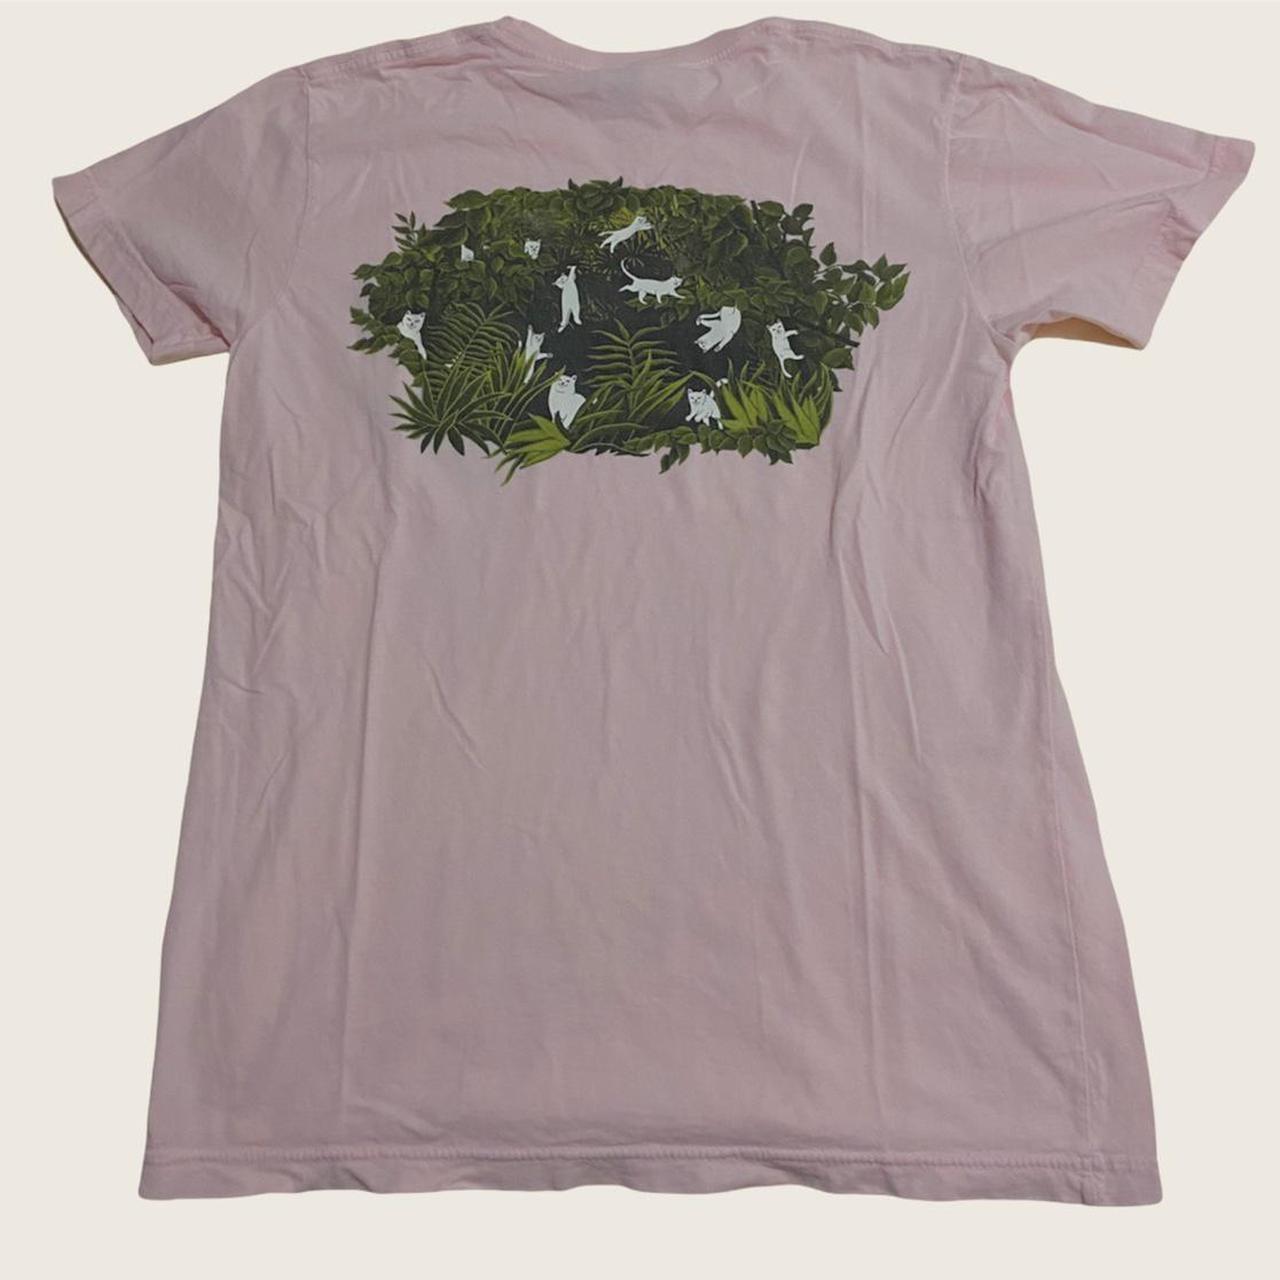 Product Image 1 - Lord Nermal Ripndip pocket tshirt -